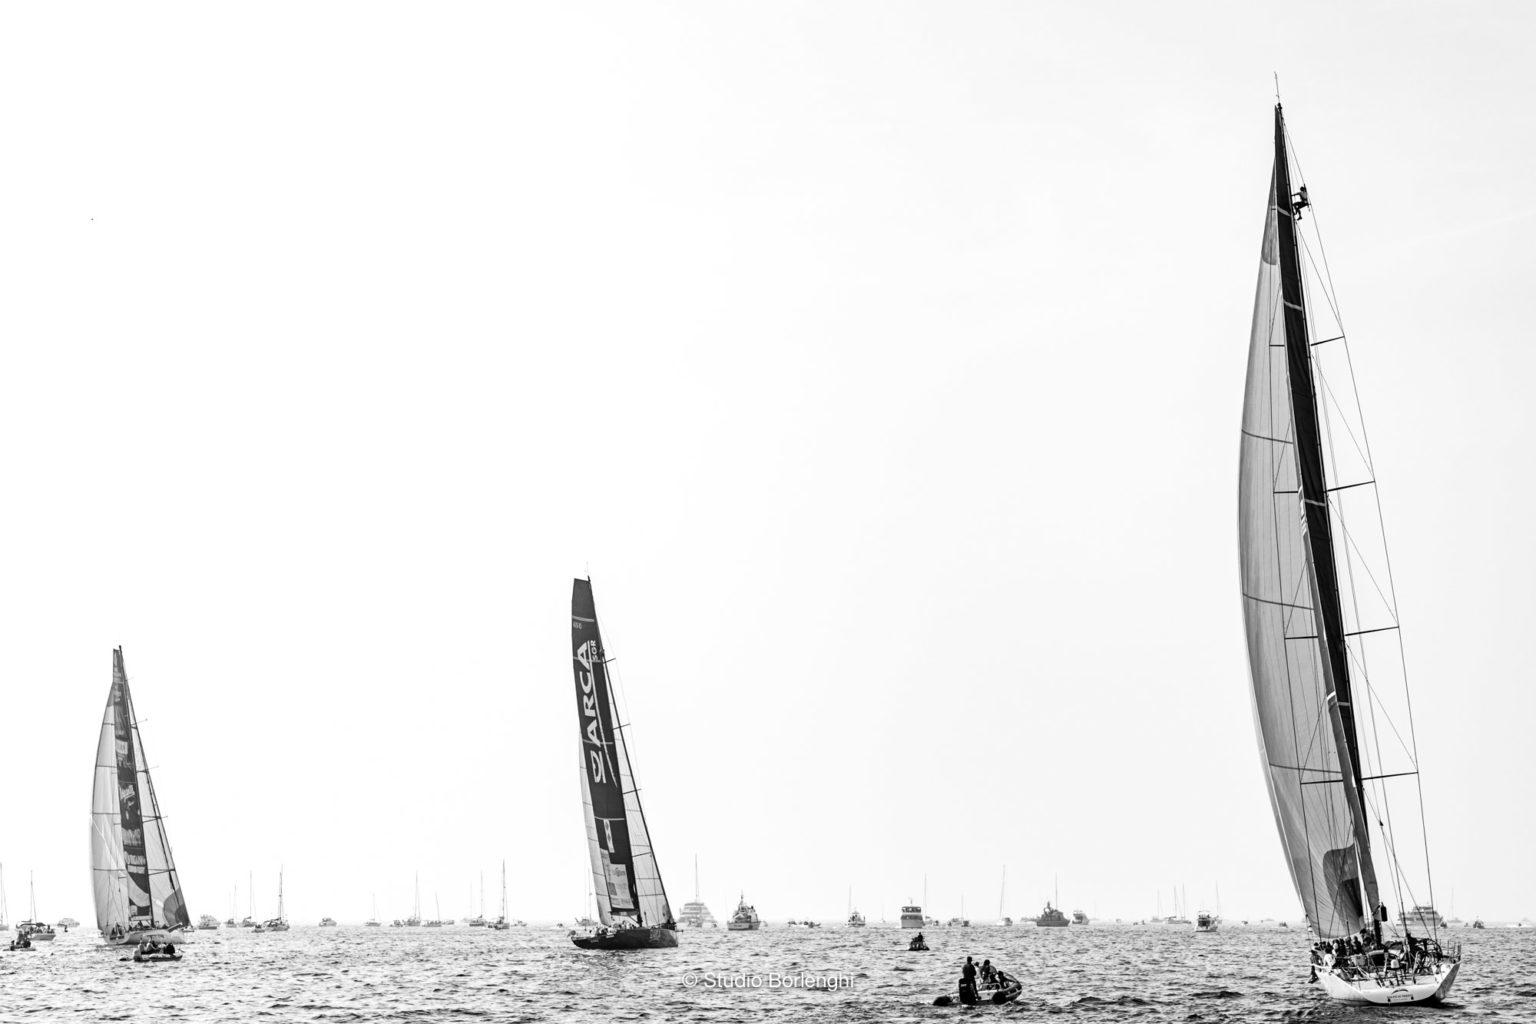 Barcolana barche a vela